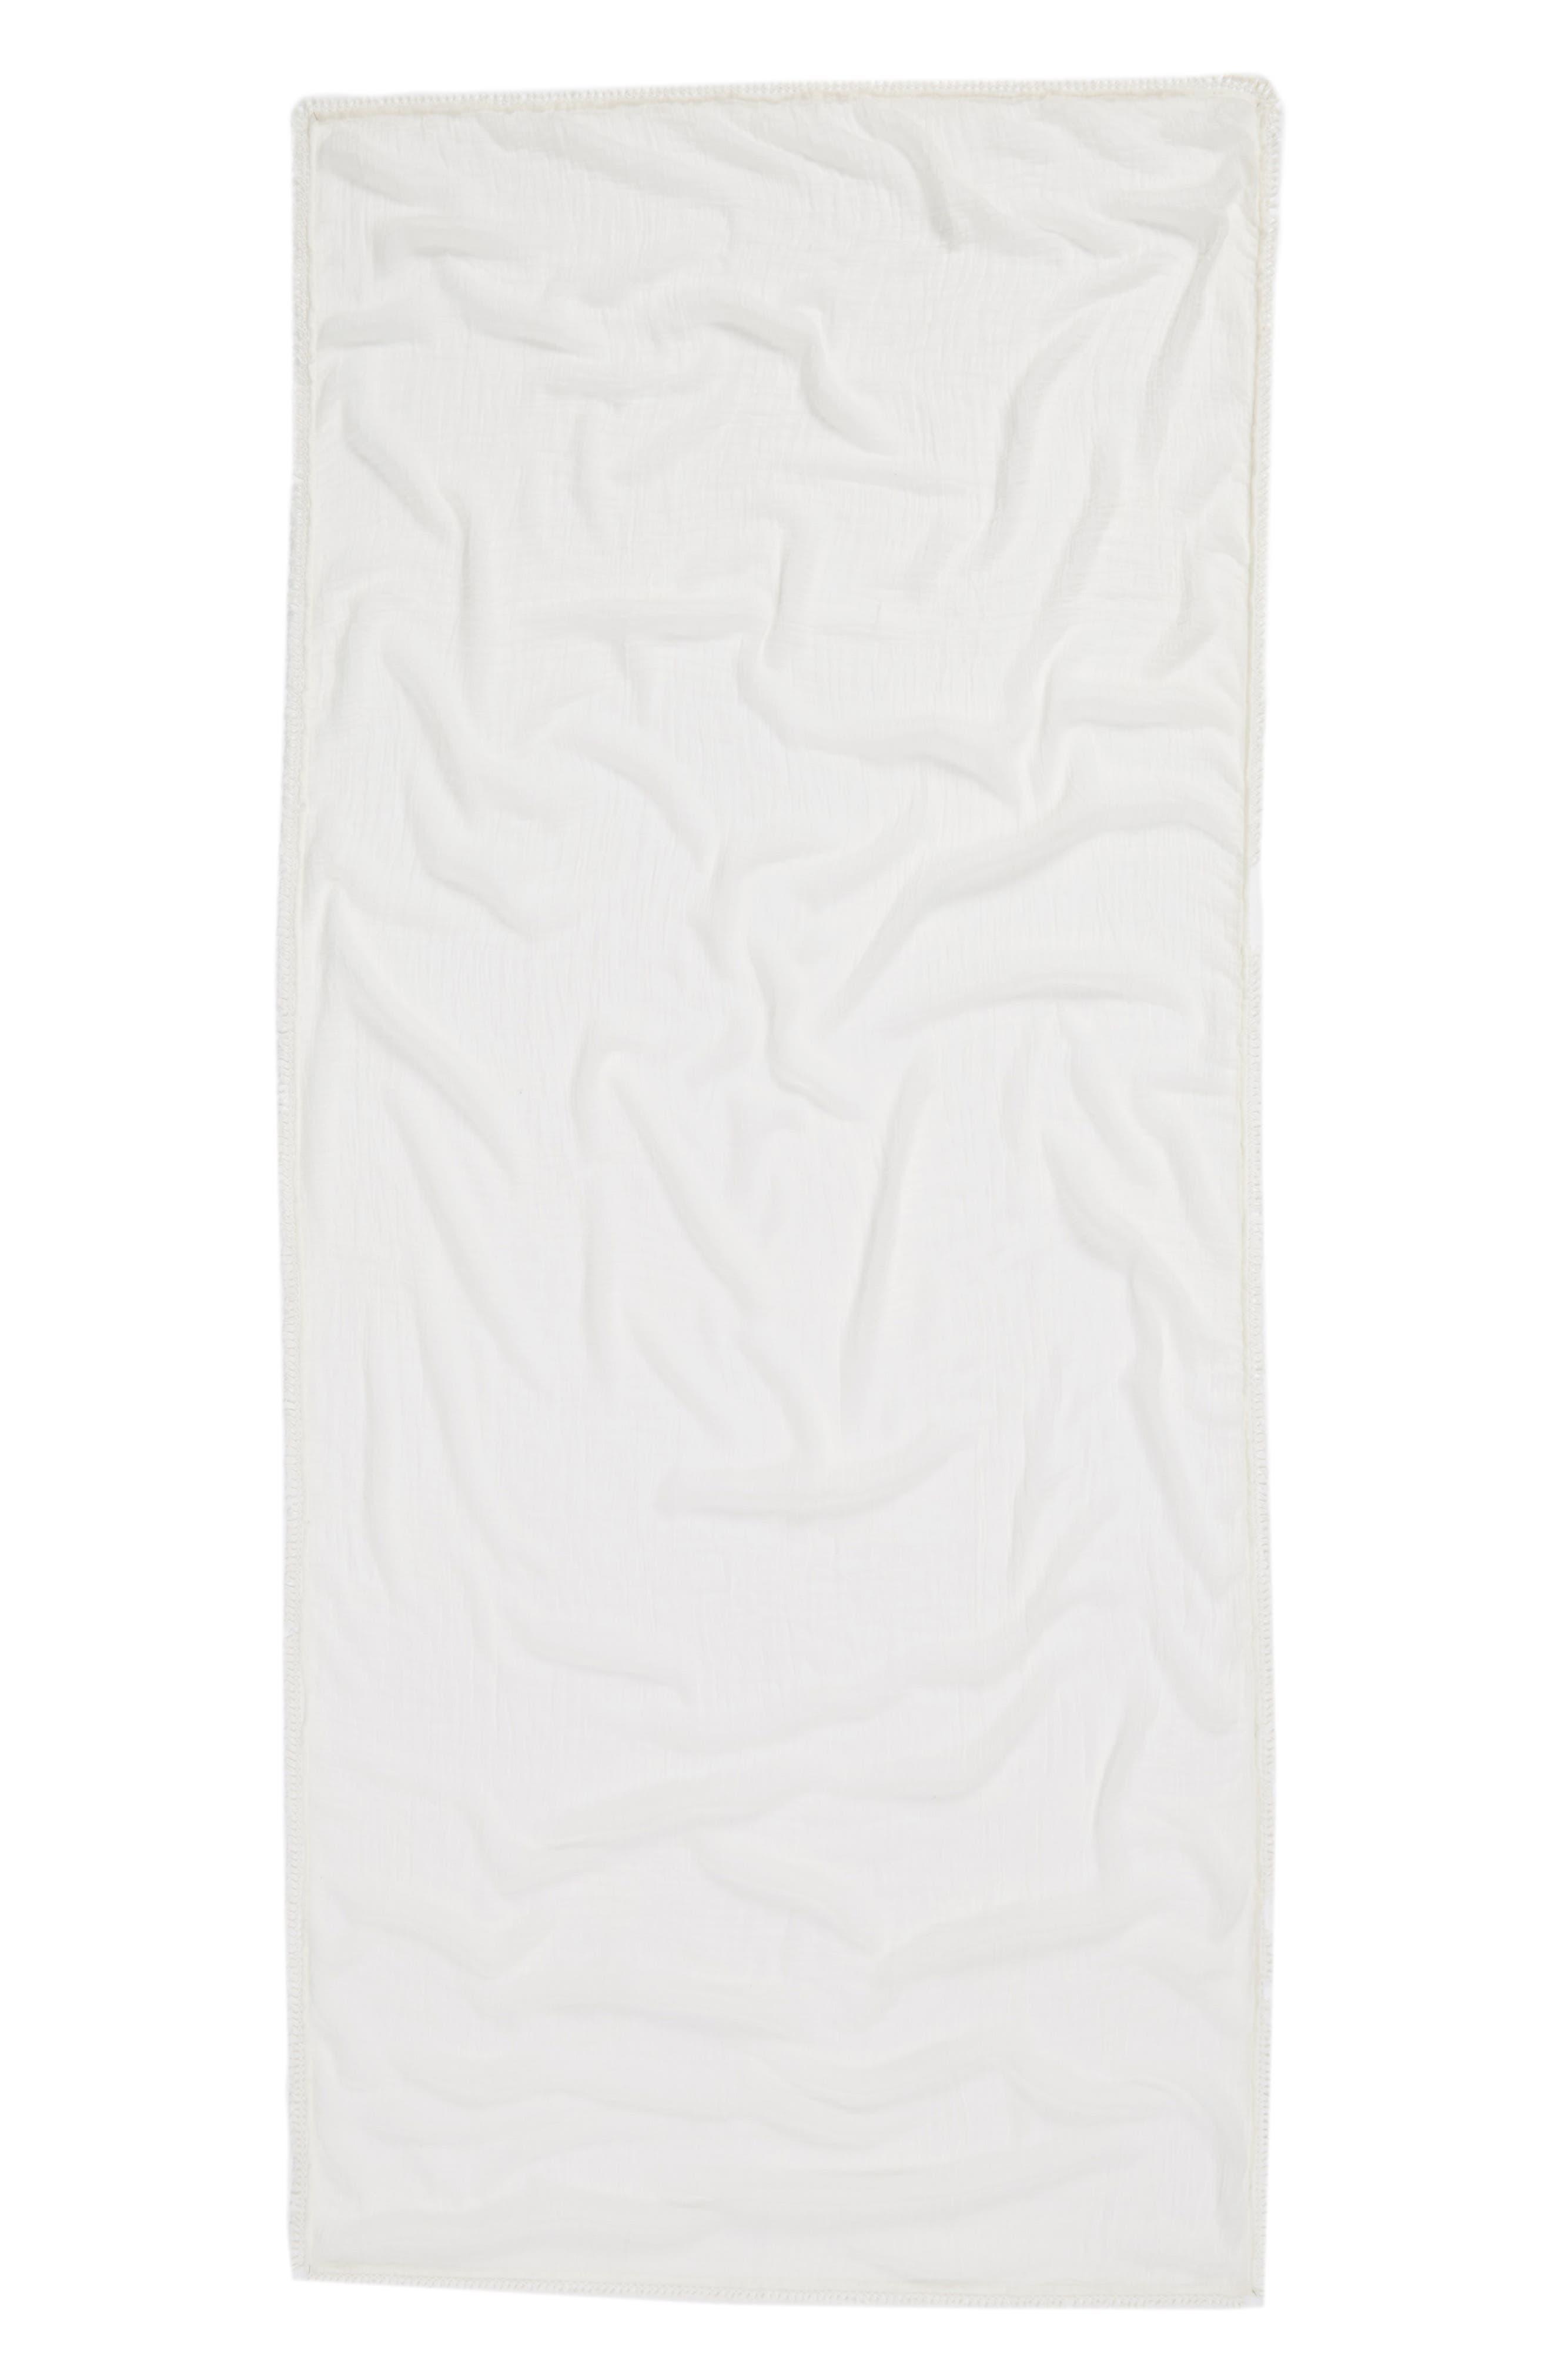 Tassel Wrap,                             Alternate thumbnail 3, color,                             Ivory Marshmallow